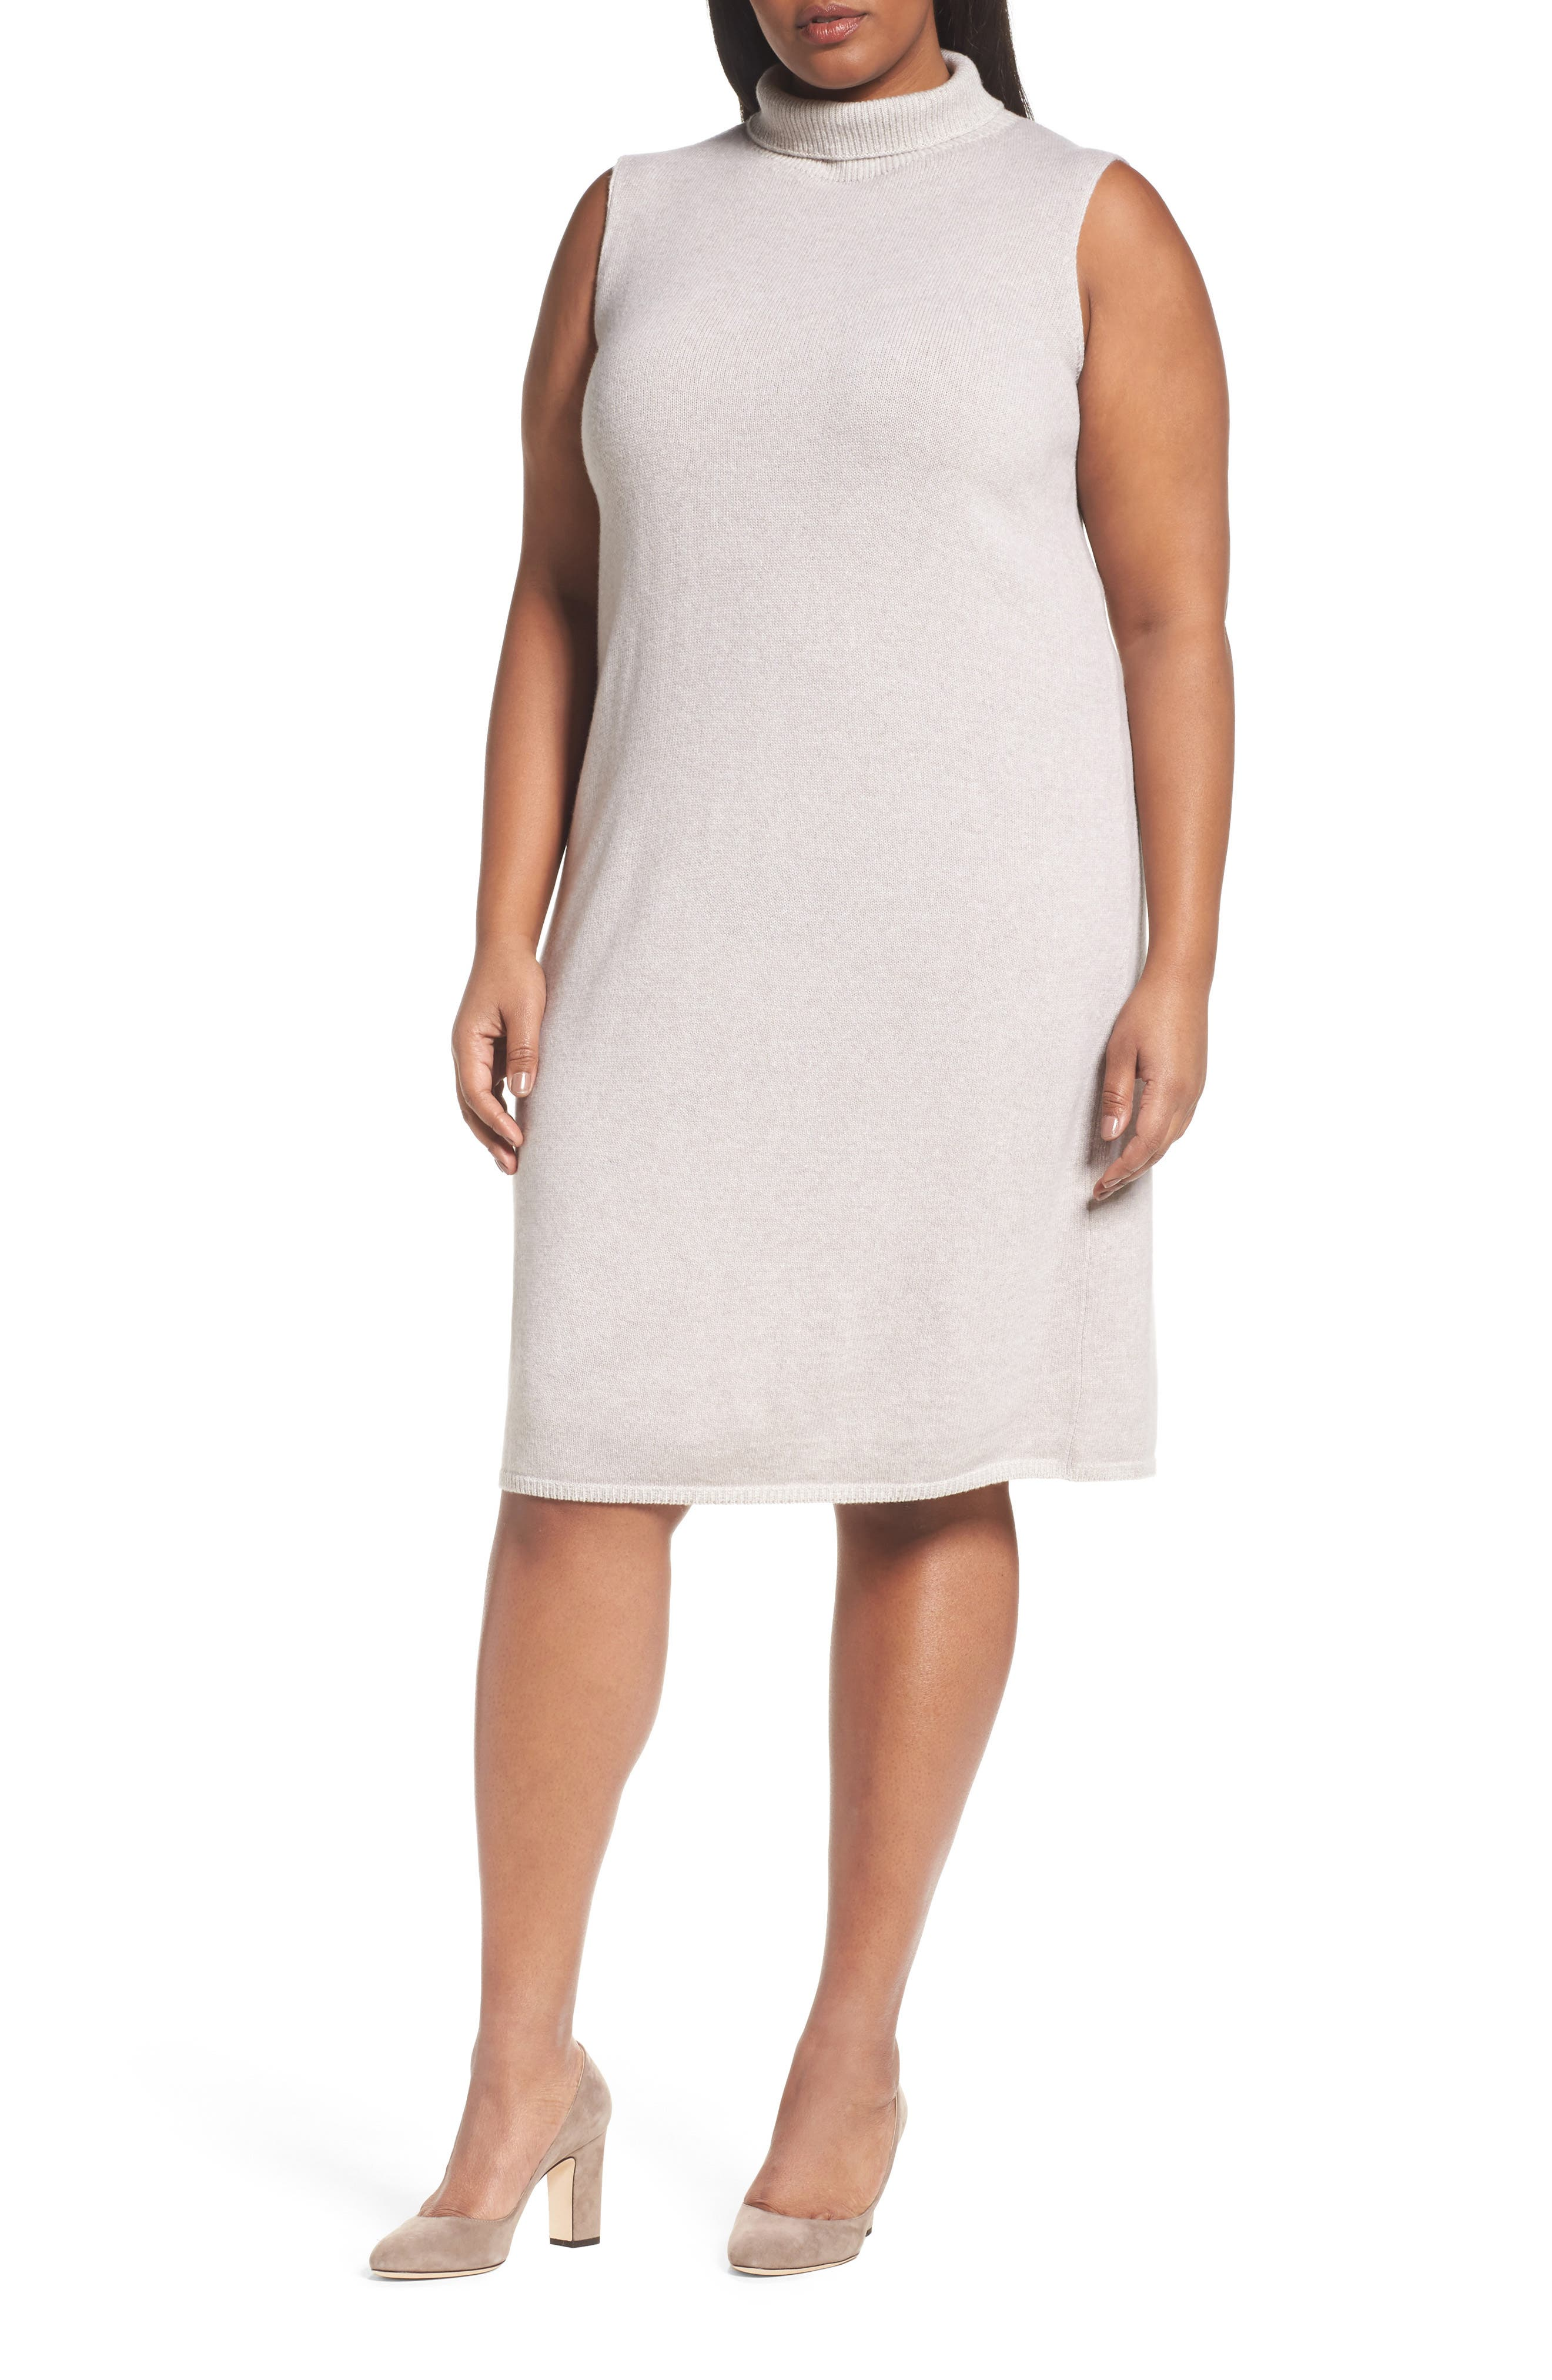 Alternate Image 1 Selected - Lafayette 148 New York Vanise Merino Wool & Cashmere Sweater Dress (Plus Size)